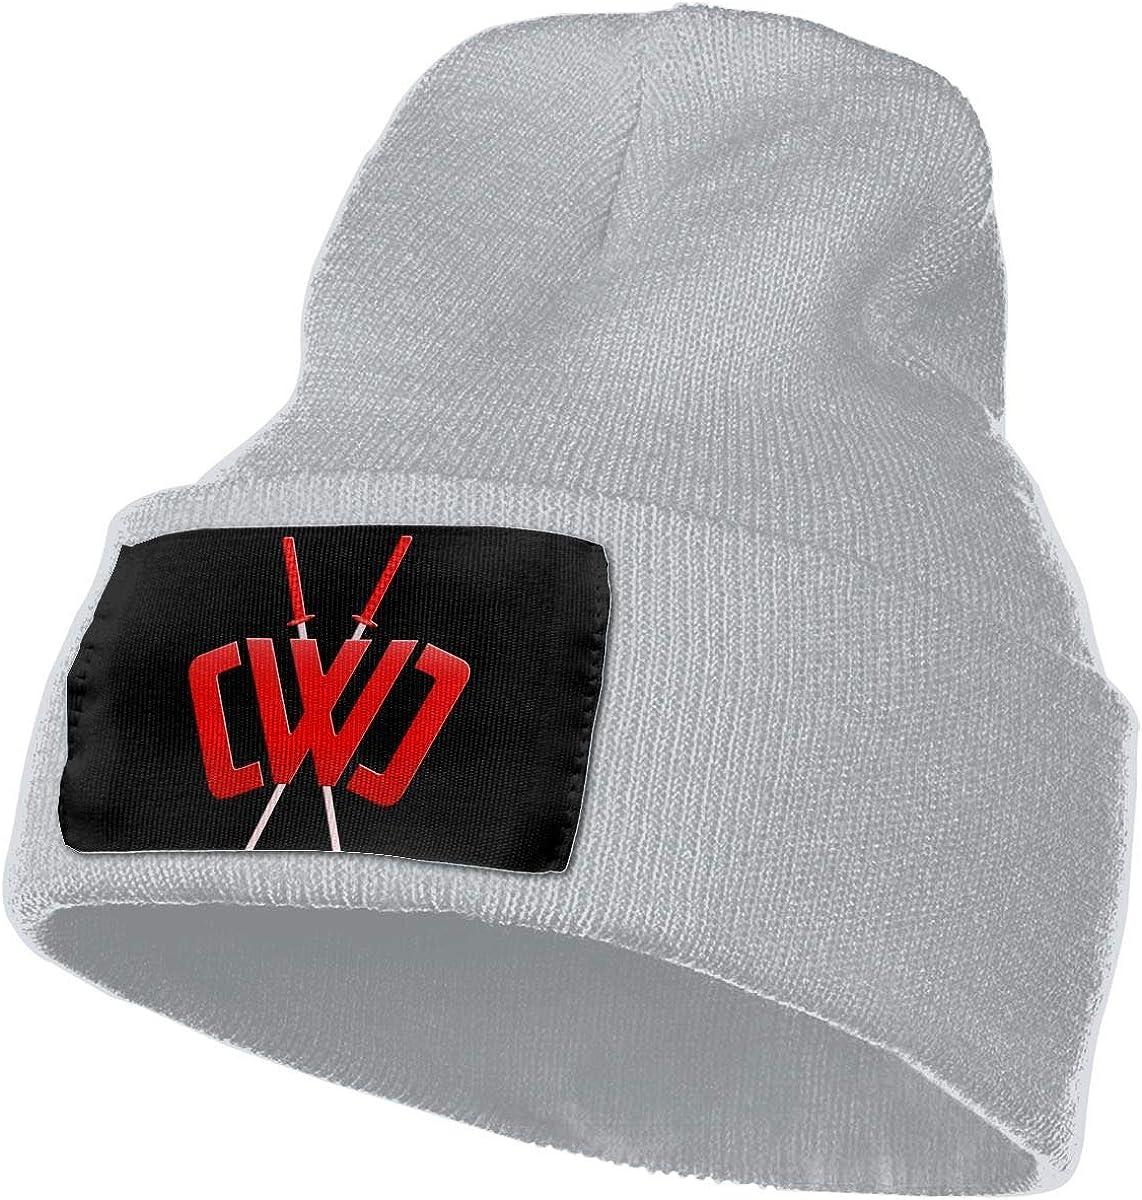 6 ducheng CWC Chad Wild Clay Ninja Knit Beanie Skull Cap Winter Cuff Beanie Hat Unisex Adult